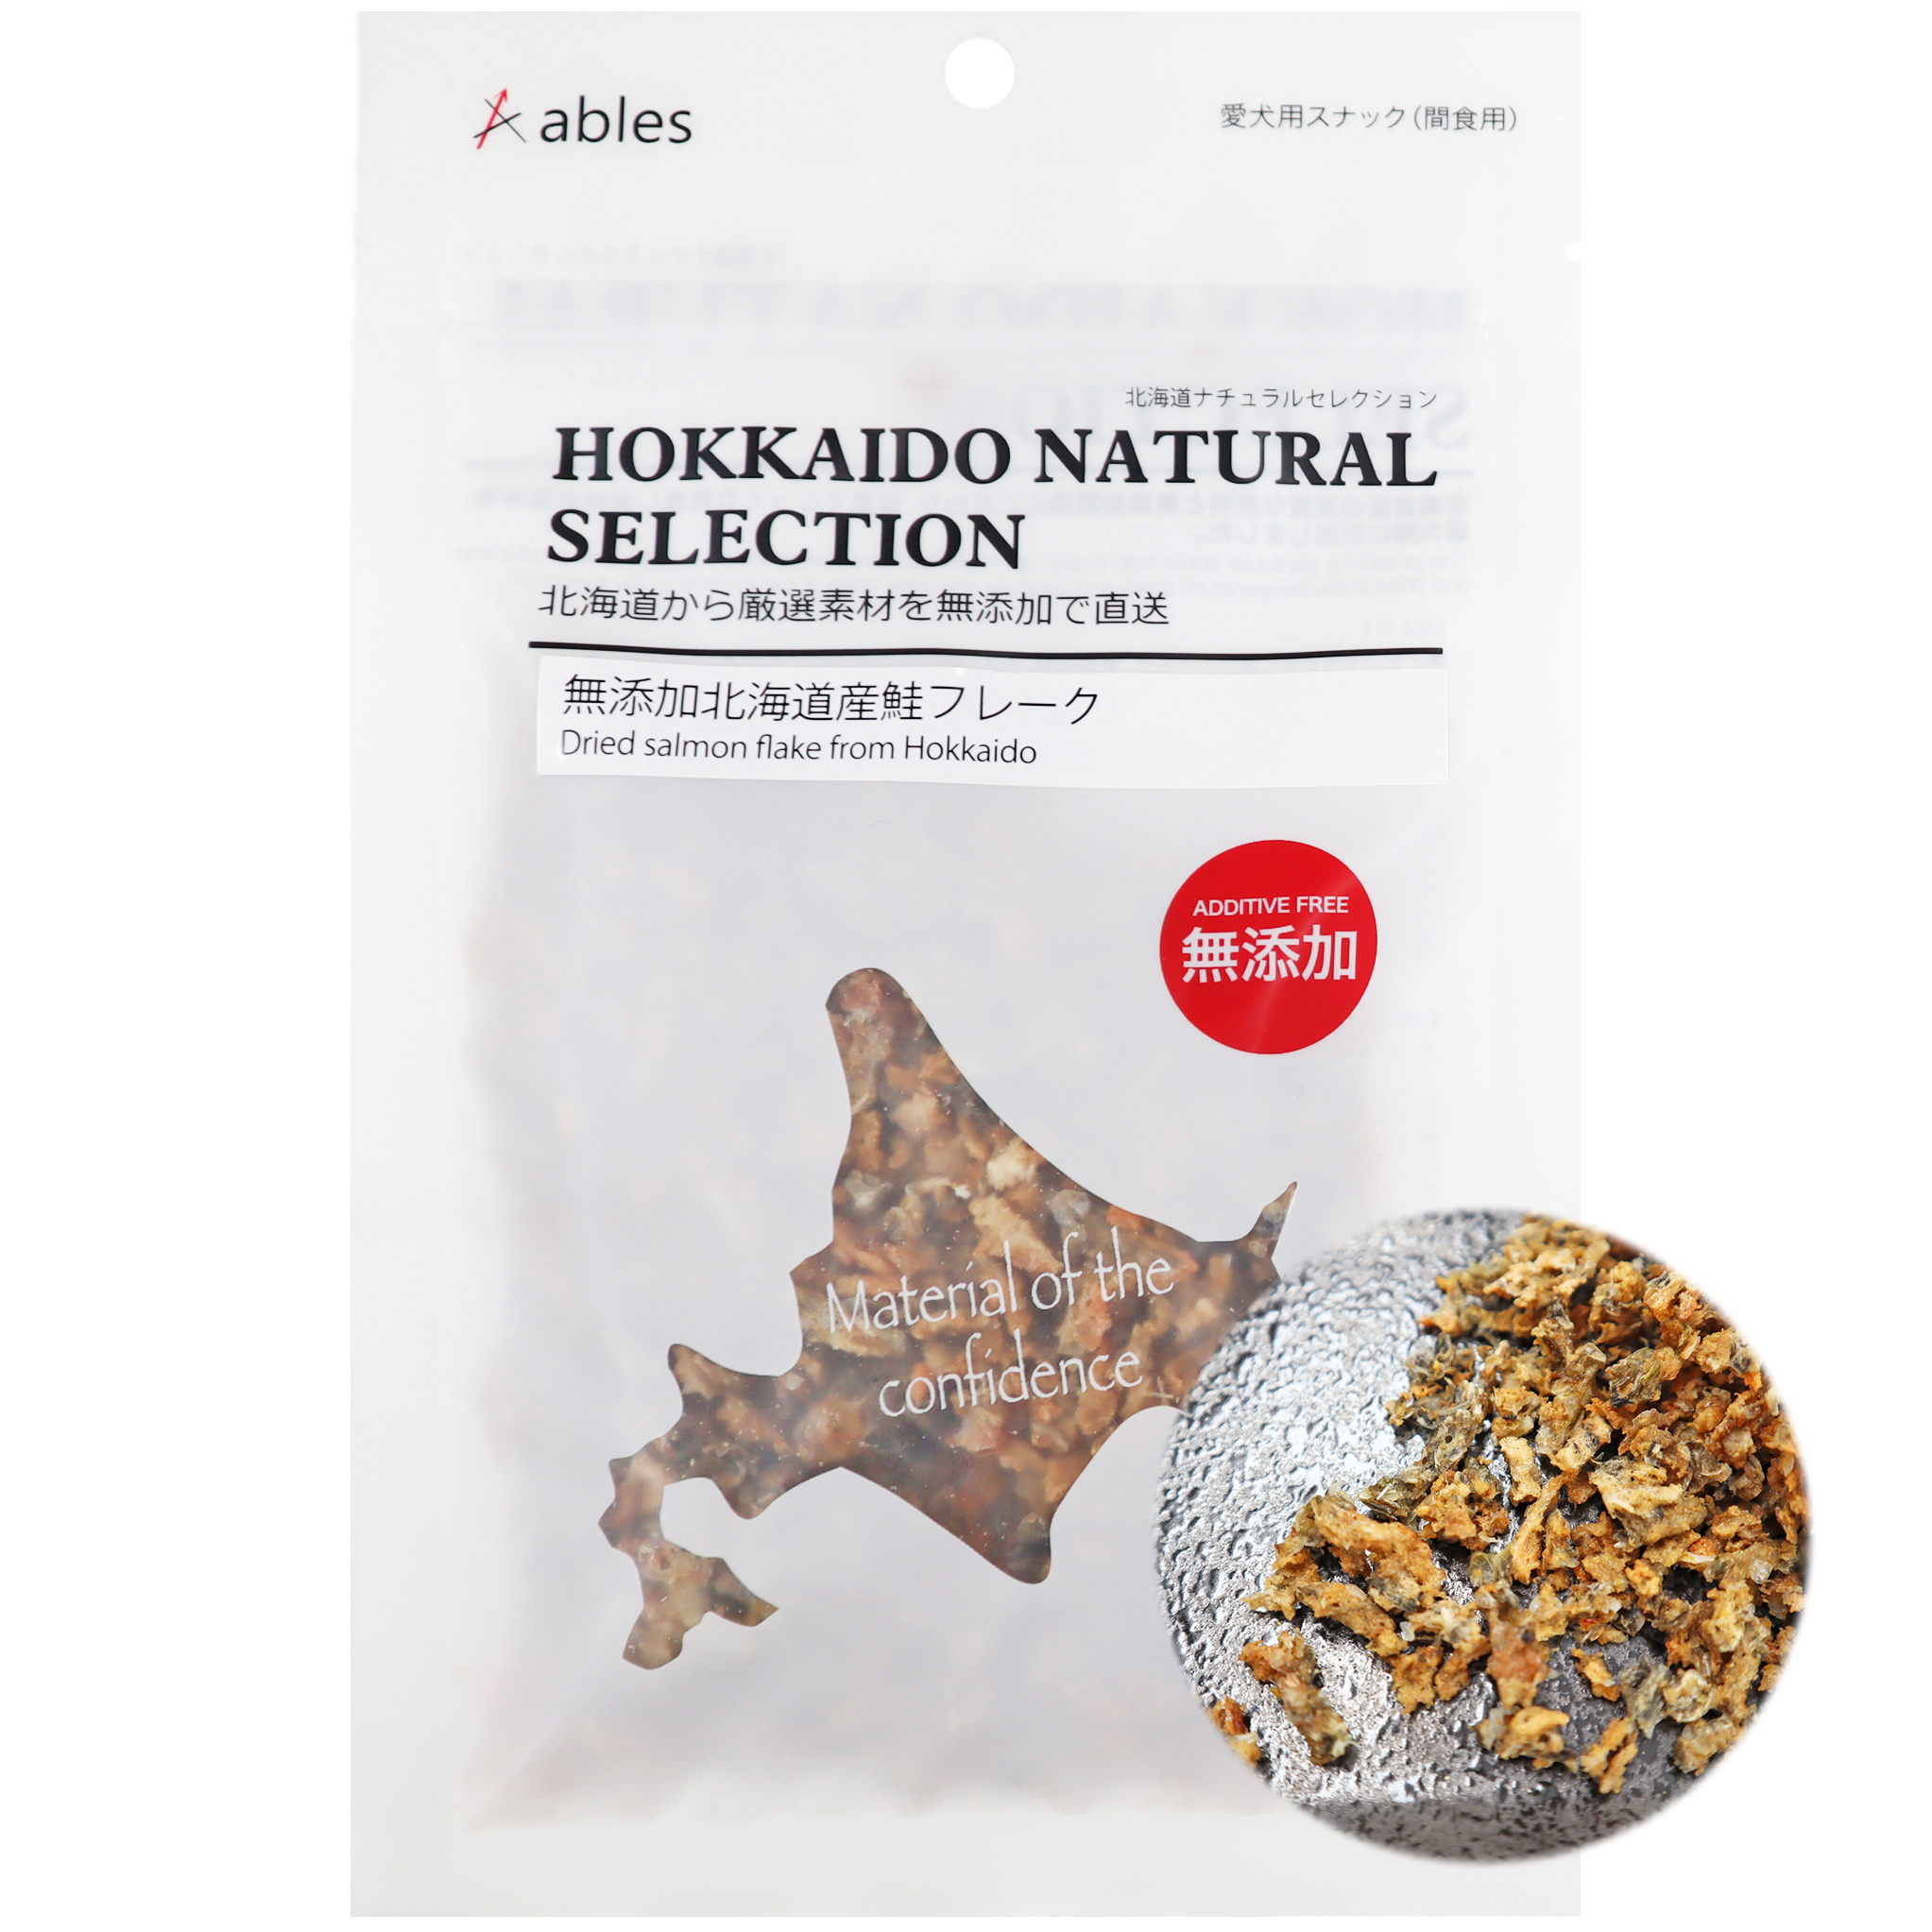 HOKKAIDO NATURAL SELECTION 無添加北海道産鮭フレーク 25g